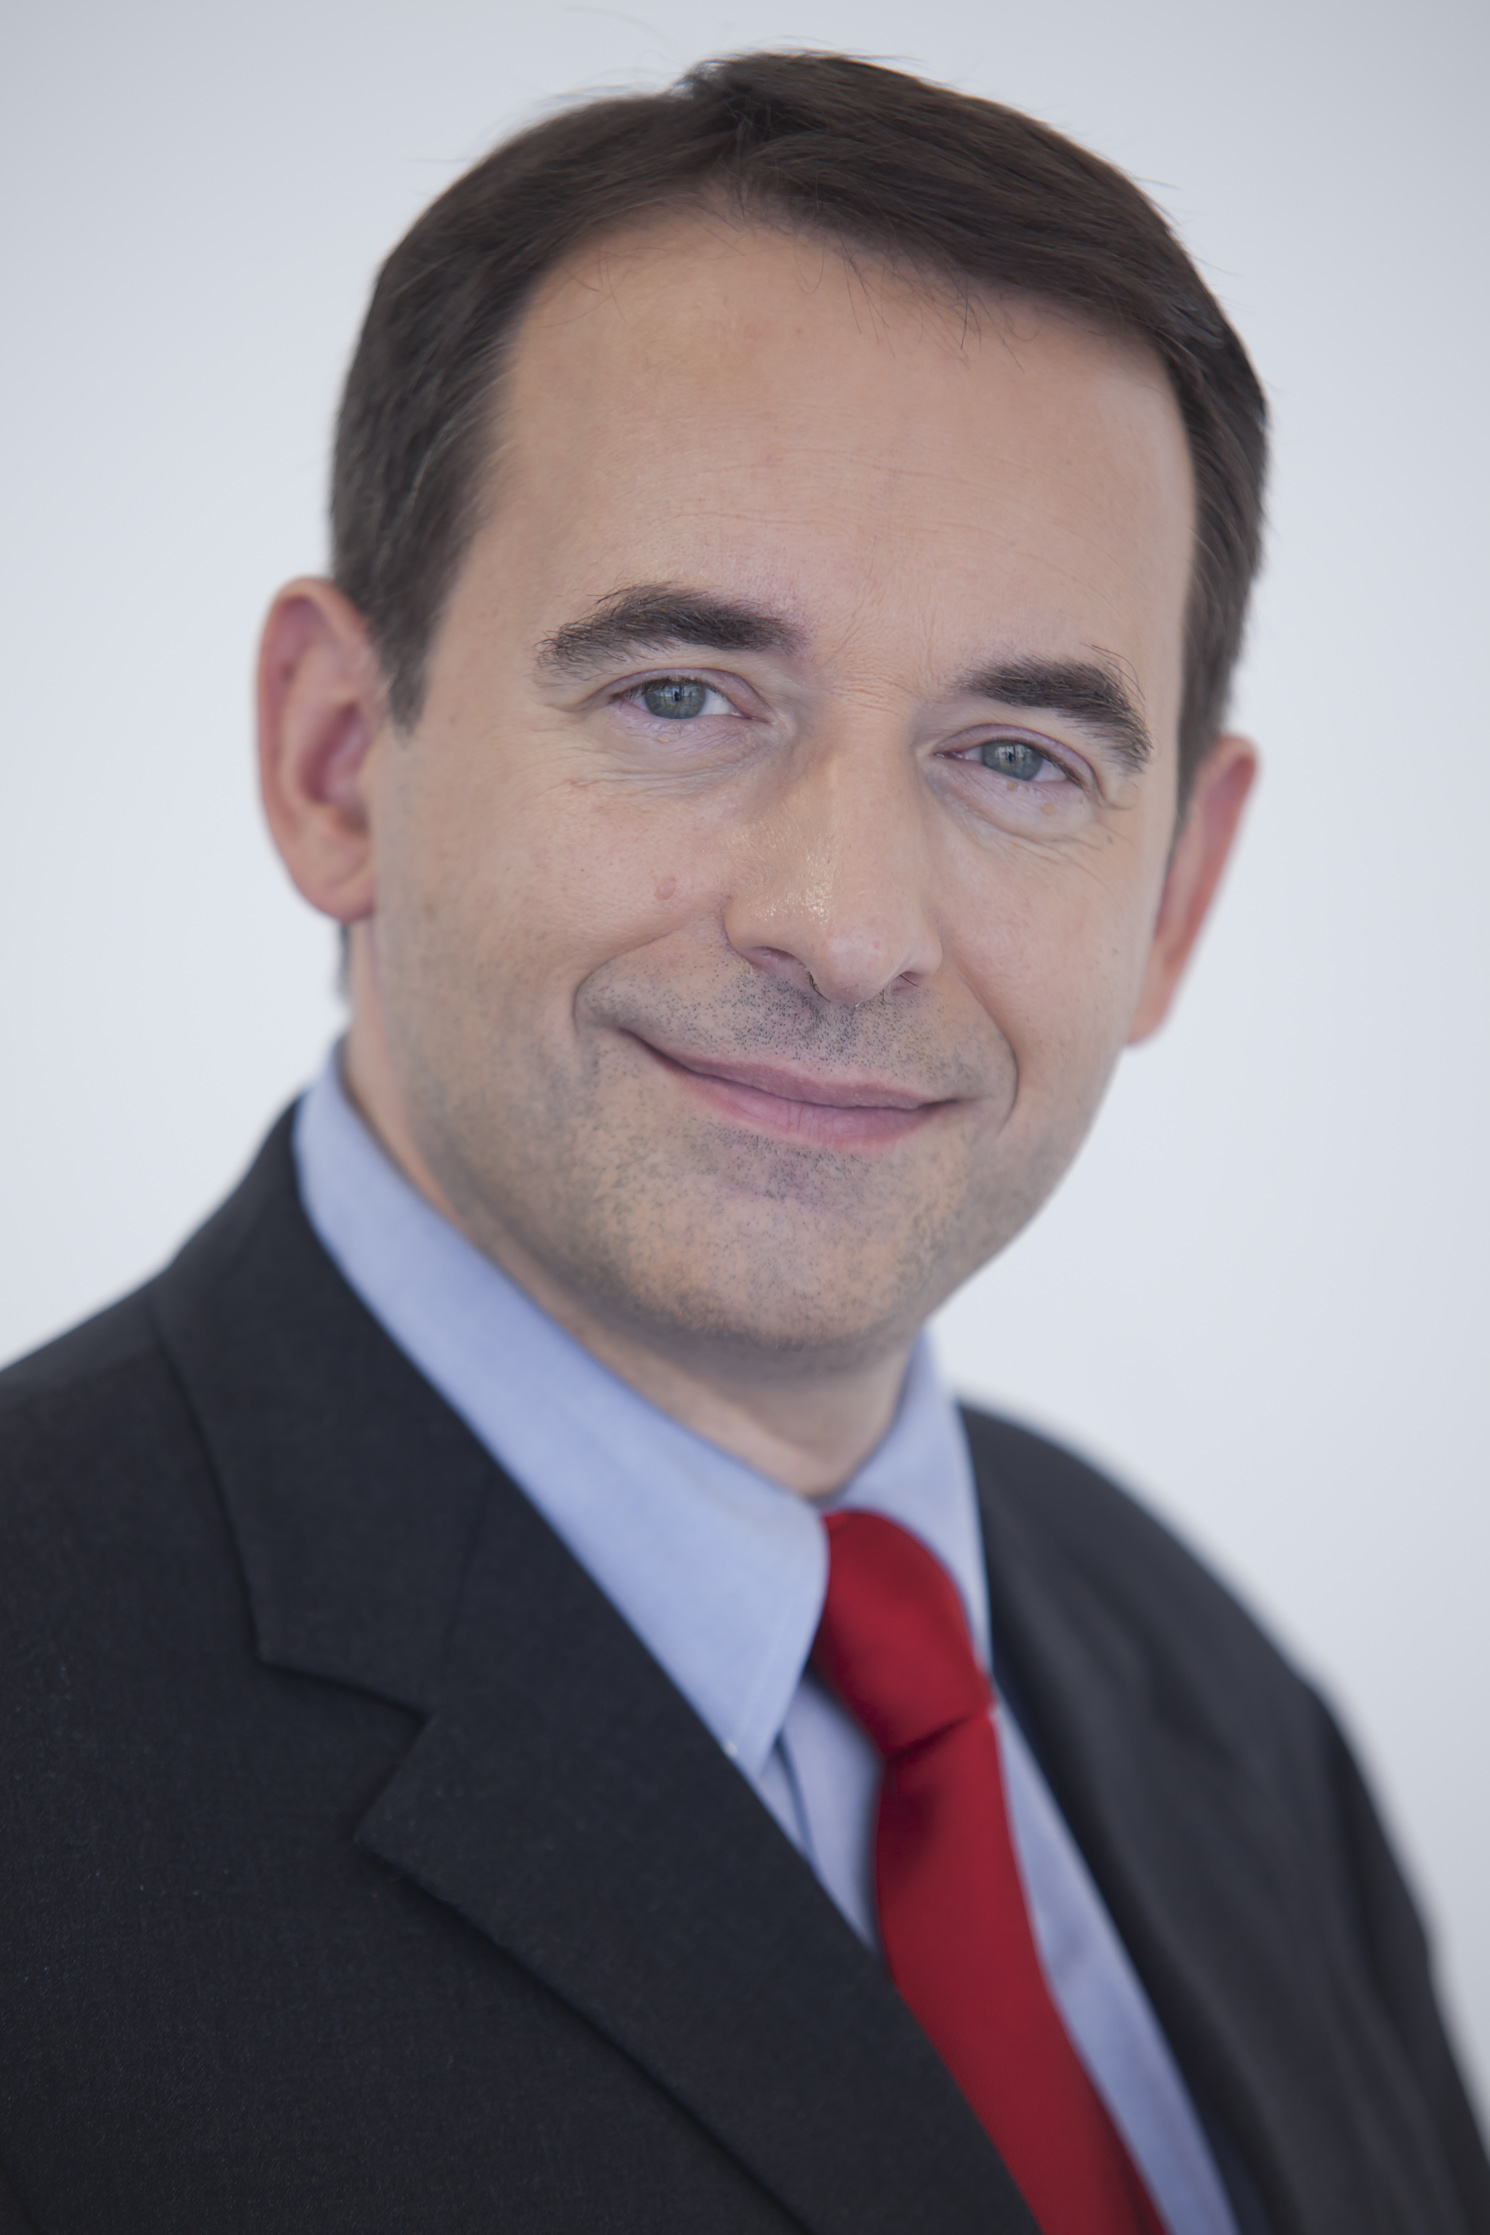 Kultusminister Prof. Dr. Lorz